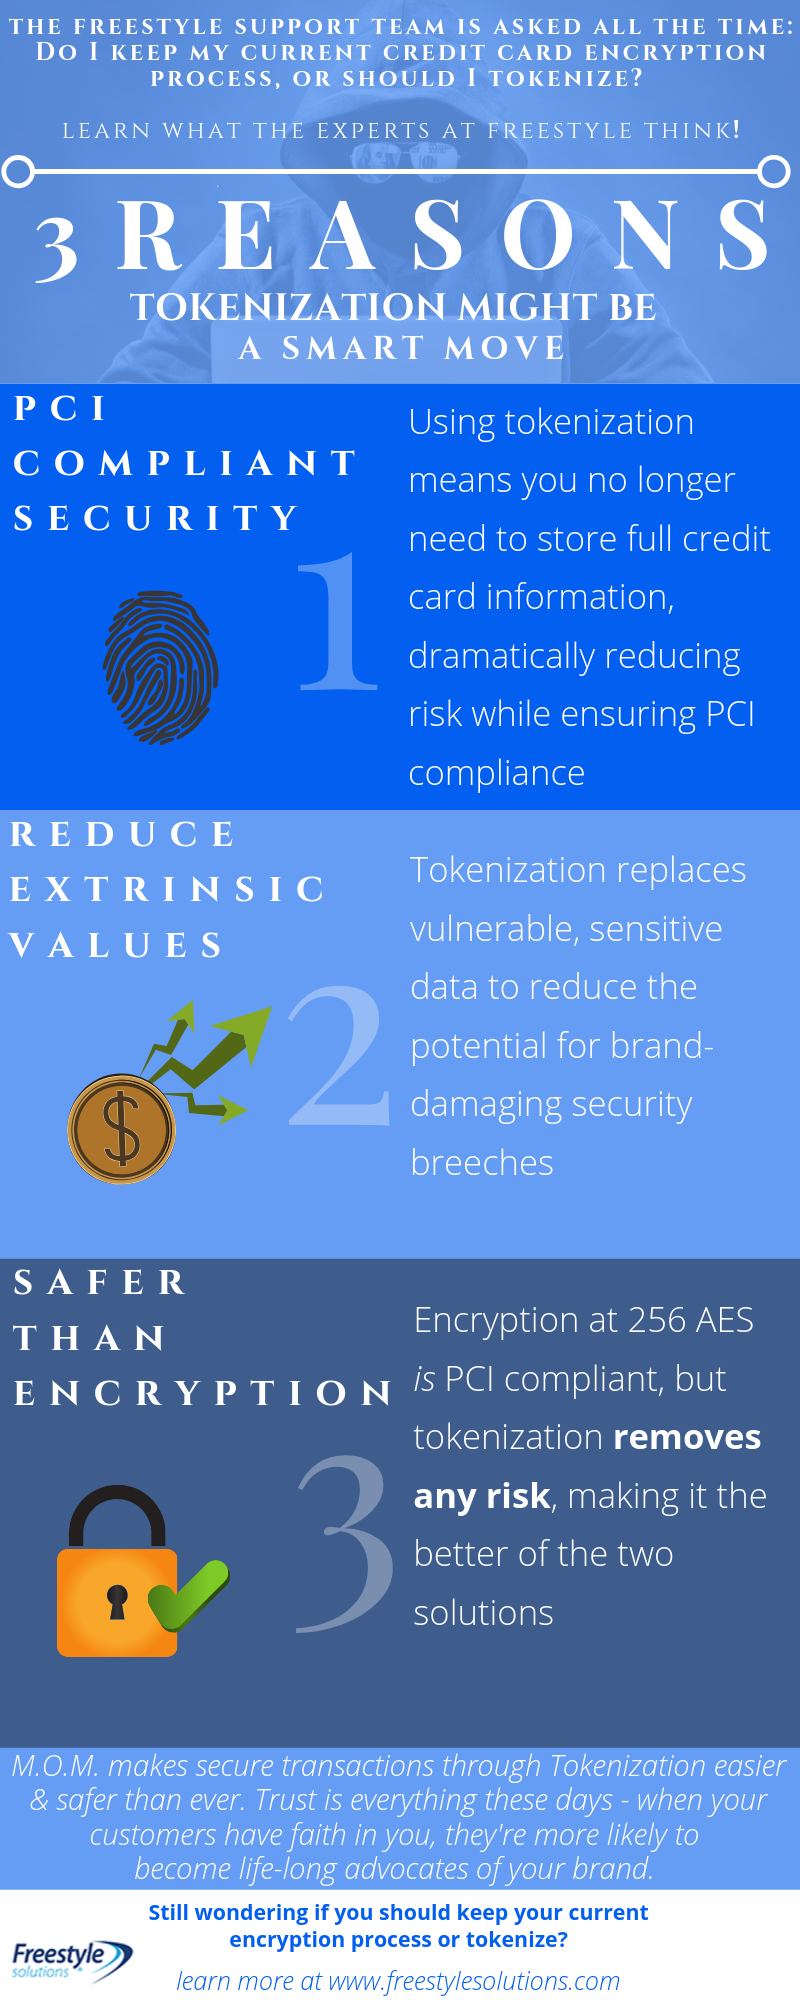 infographic on tokenization